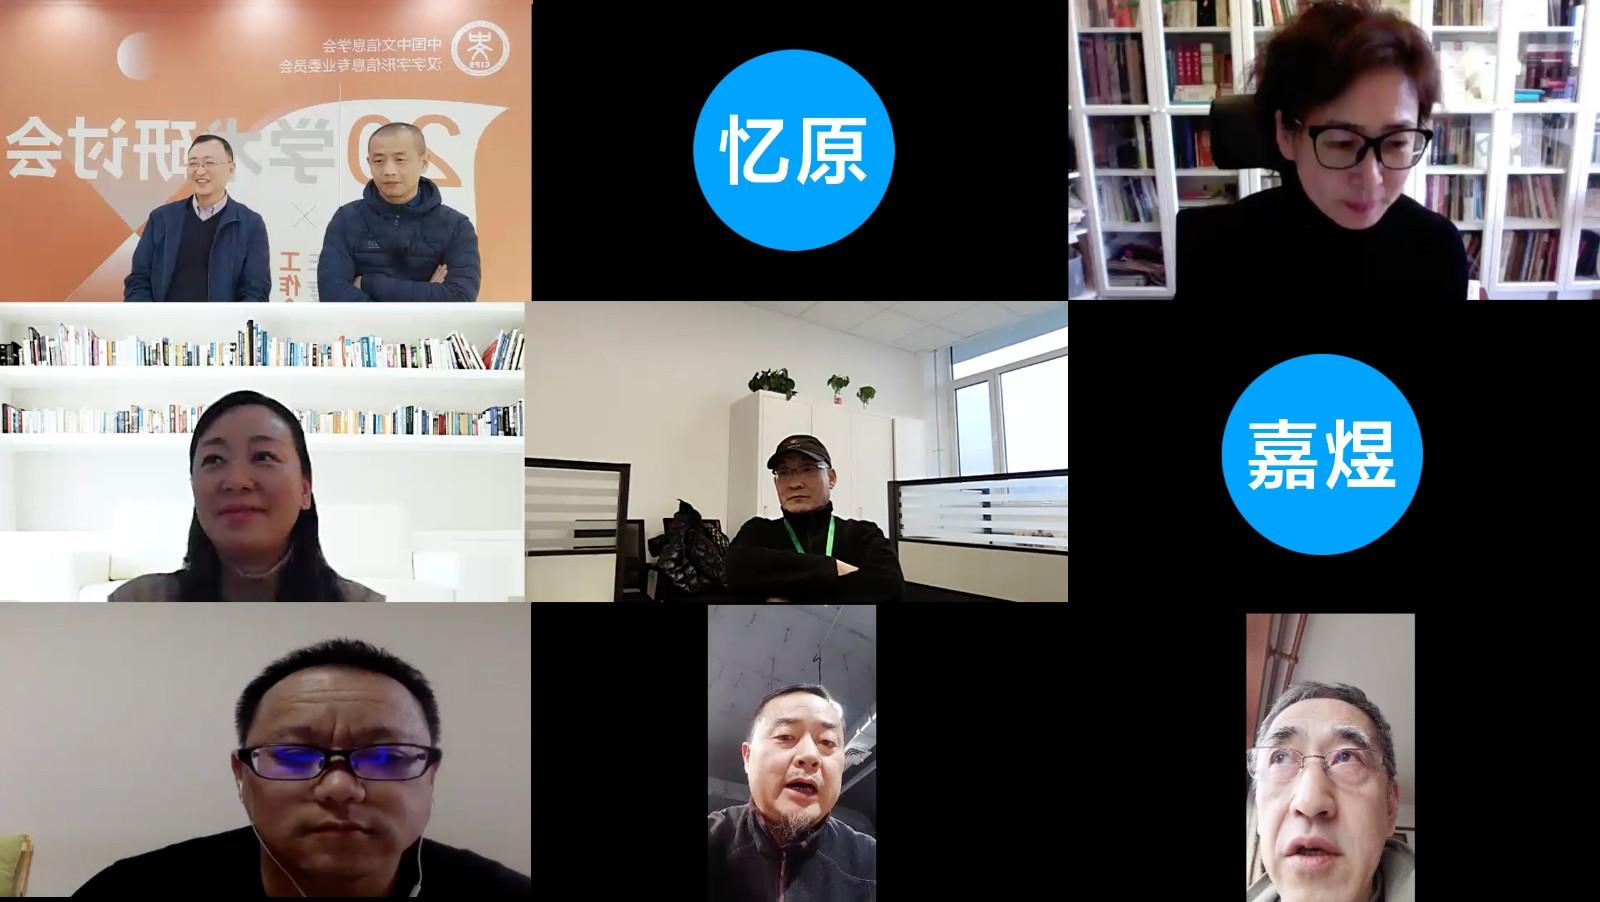 https://ft-bk1.oss-cn-zhangjiakou.aliyuncs.com/Public/Uploads/img/n_content_20201210110704_2509.jpg